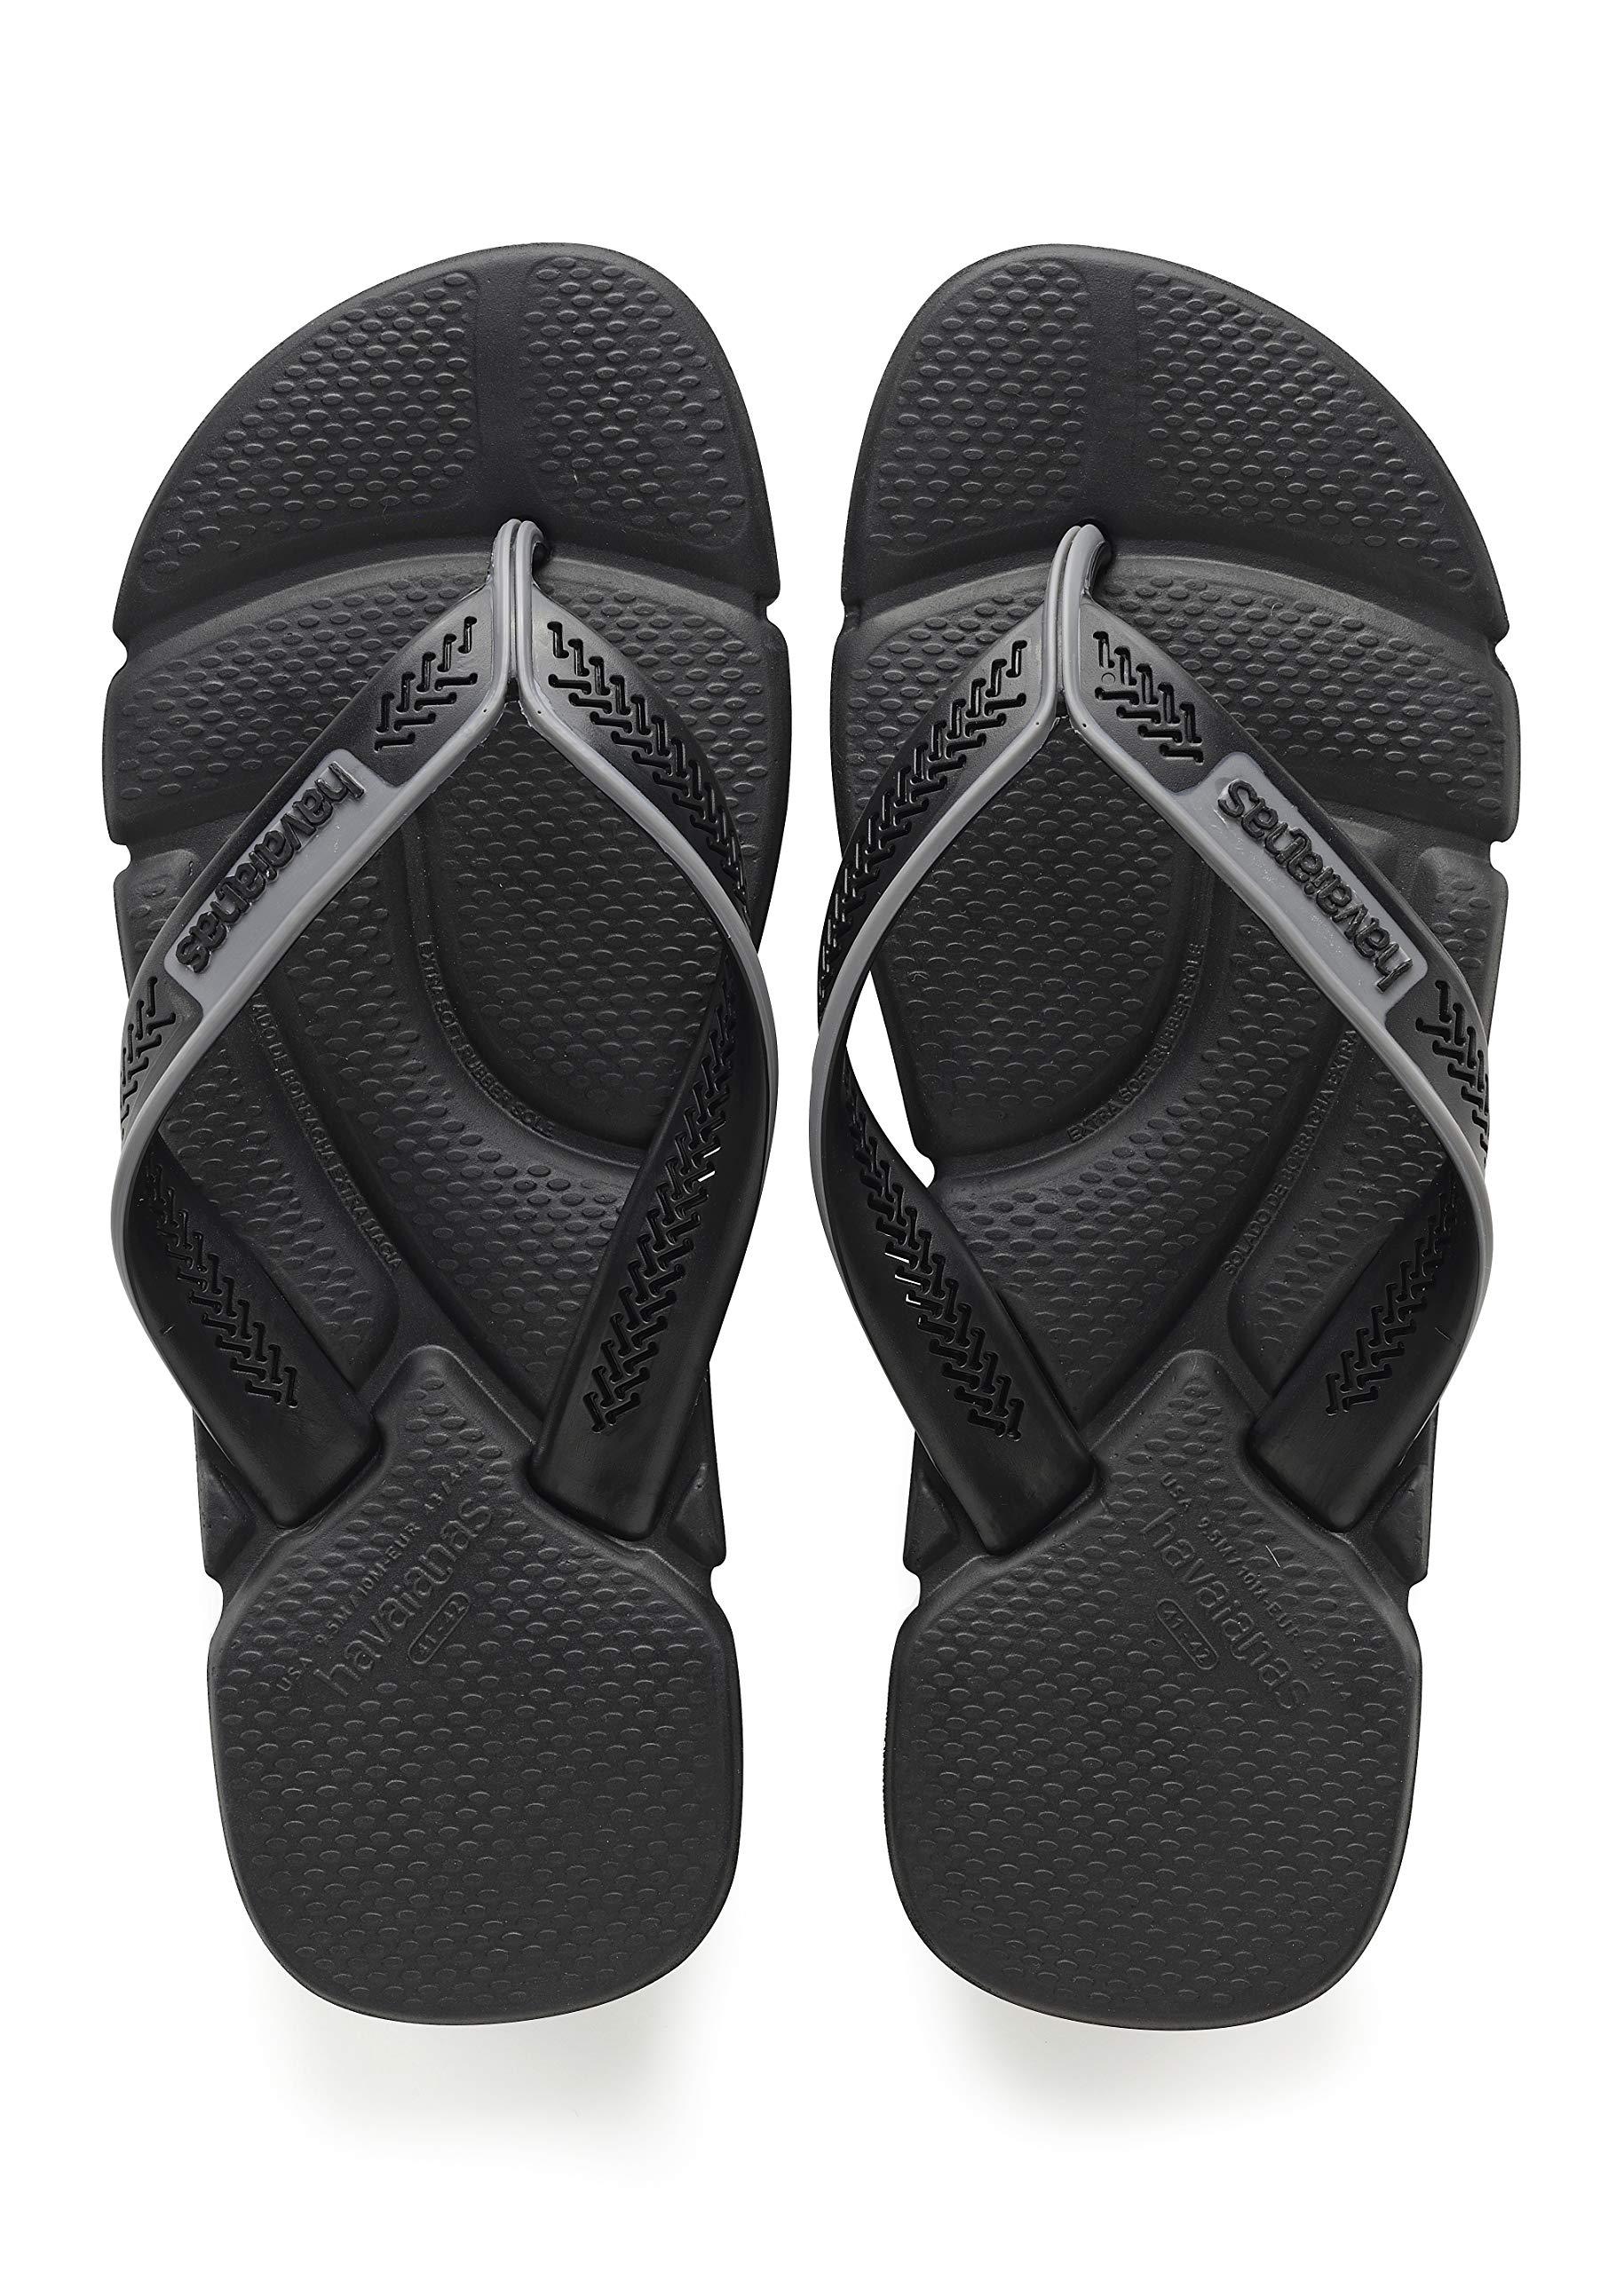 Havaianas Men's Power Flip Flop Sandal,Black/Steel Grey, 41/42 BR(11-12 M US Women's / 9-10 M US Men's)